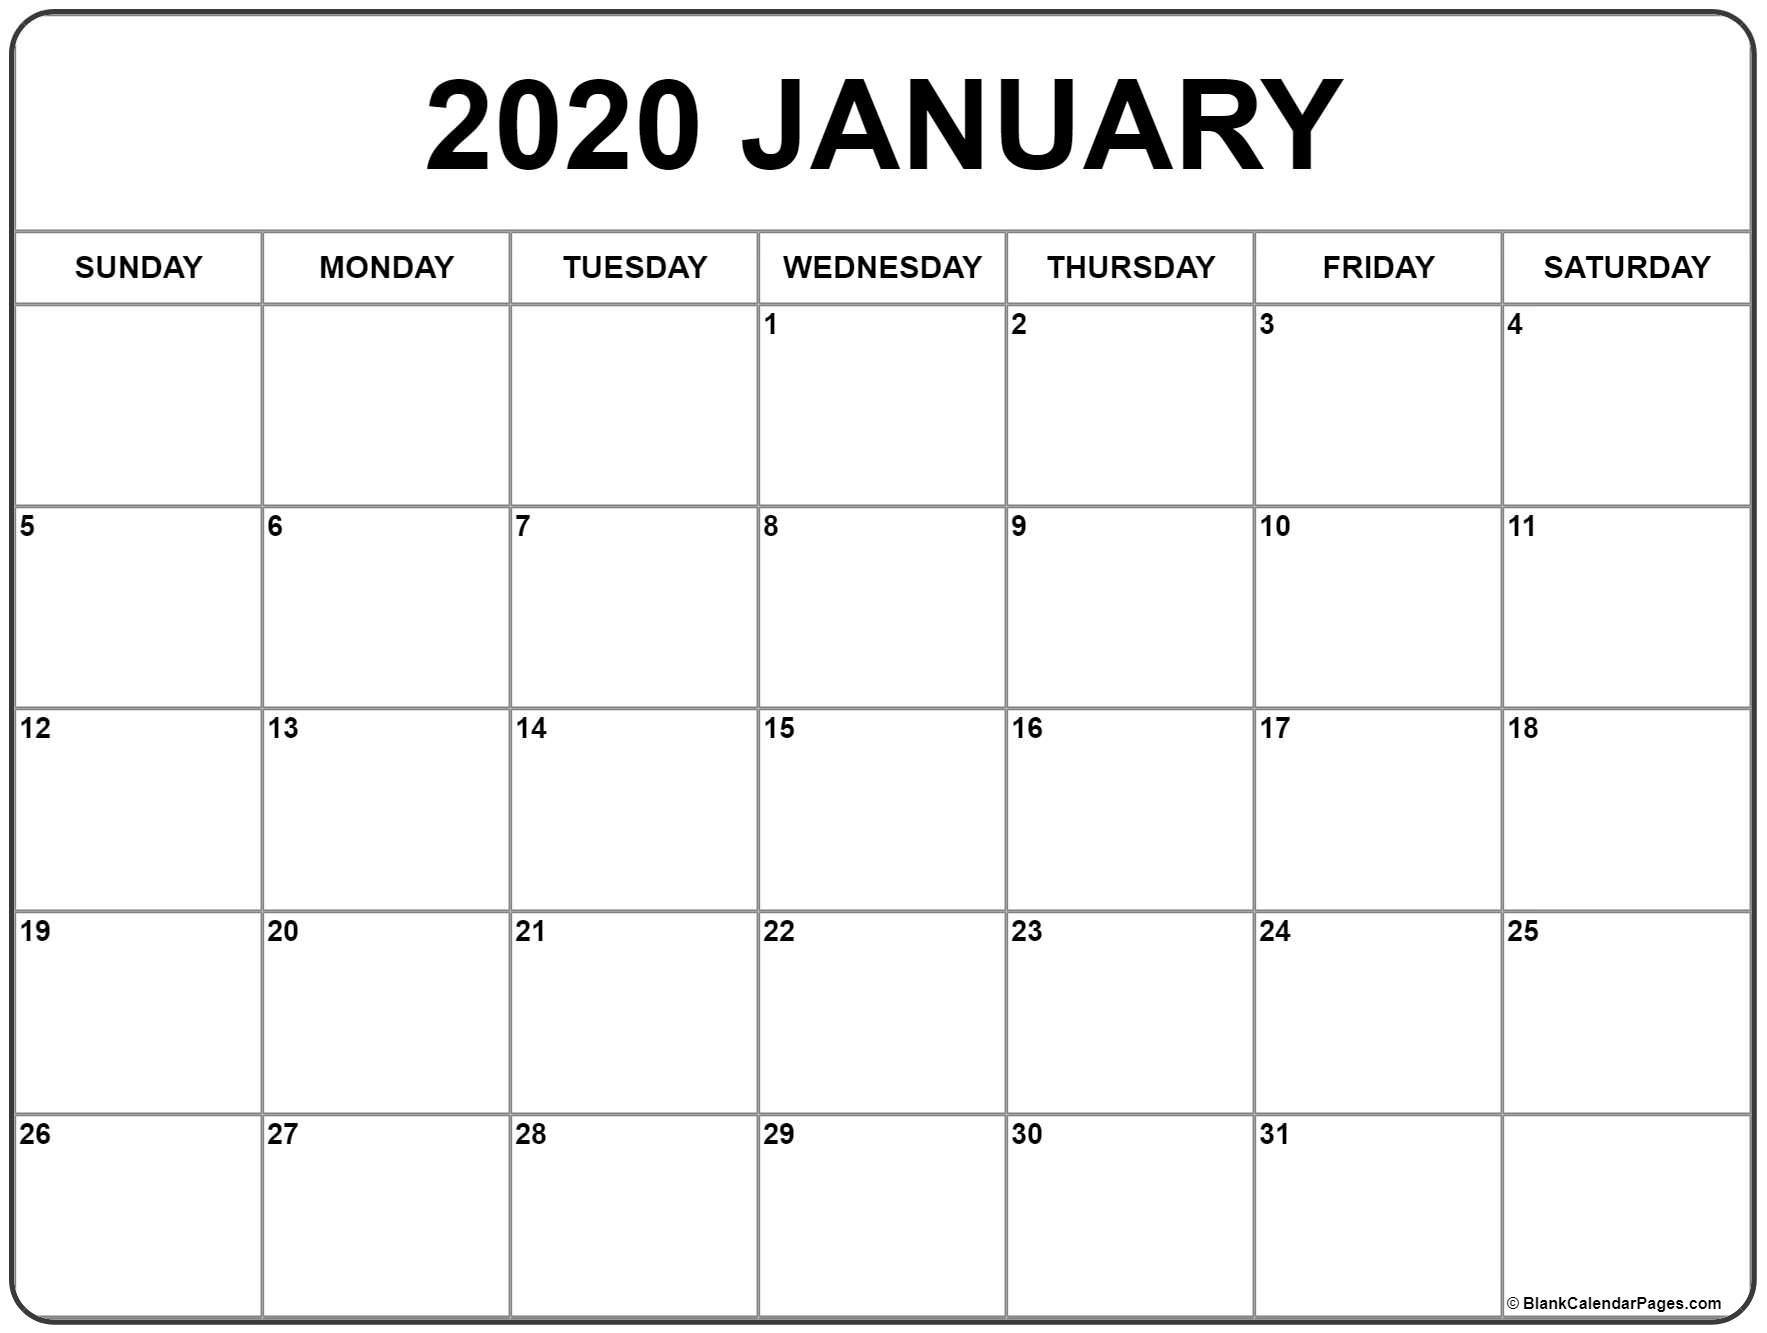 January 2020 Calendar | Free Printable Monthly Calendars